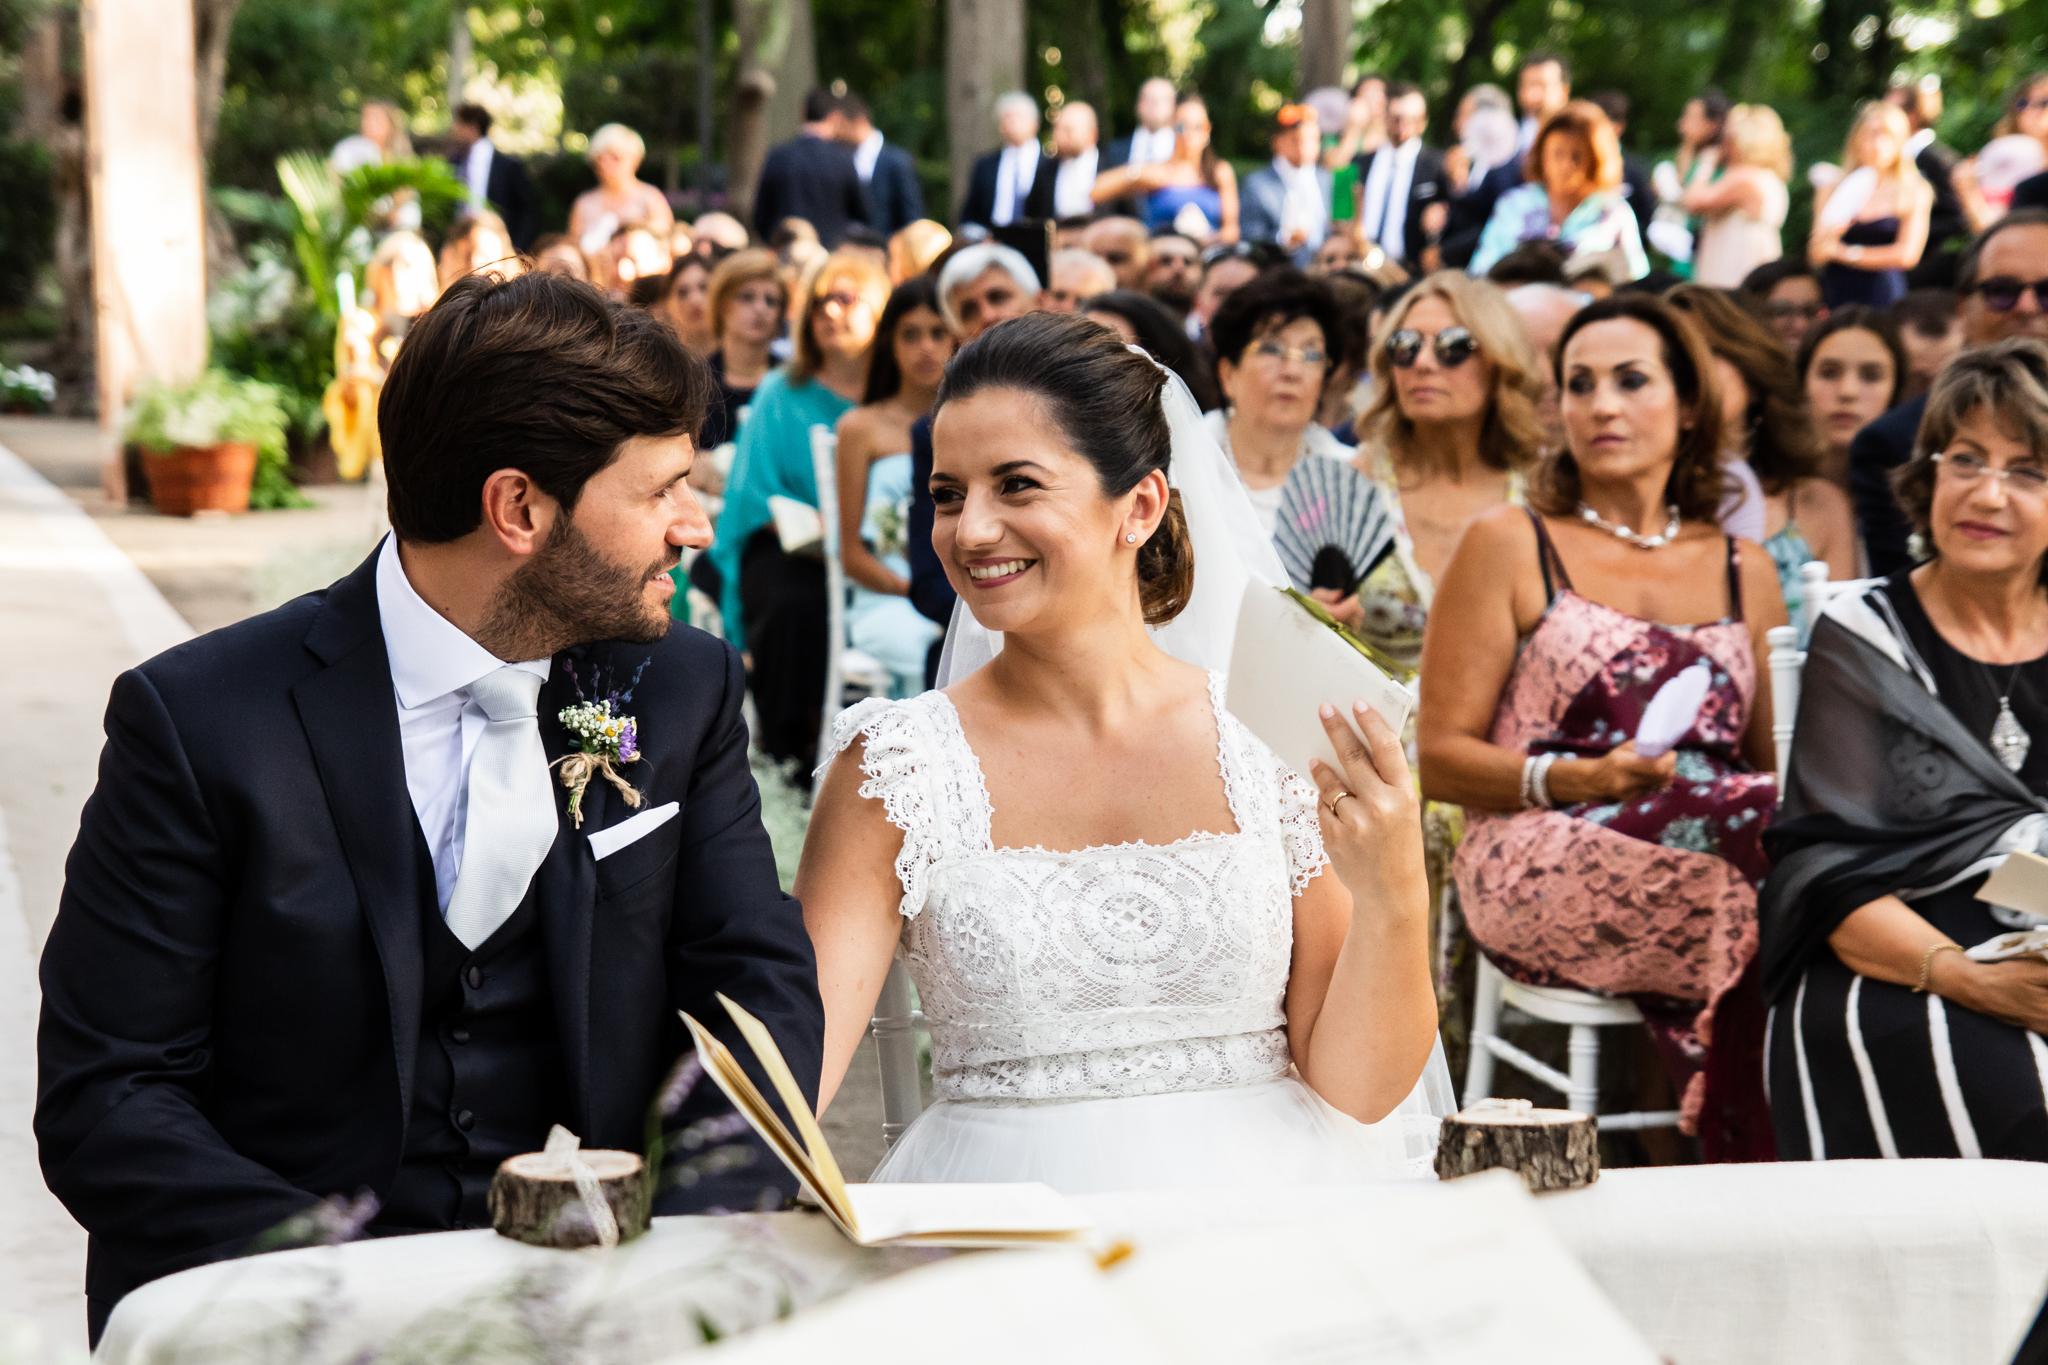 Fotografo-matrimonio-reportage-Sicilia-Catania-20.jpg